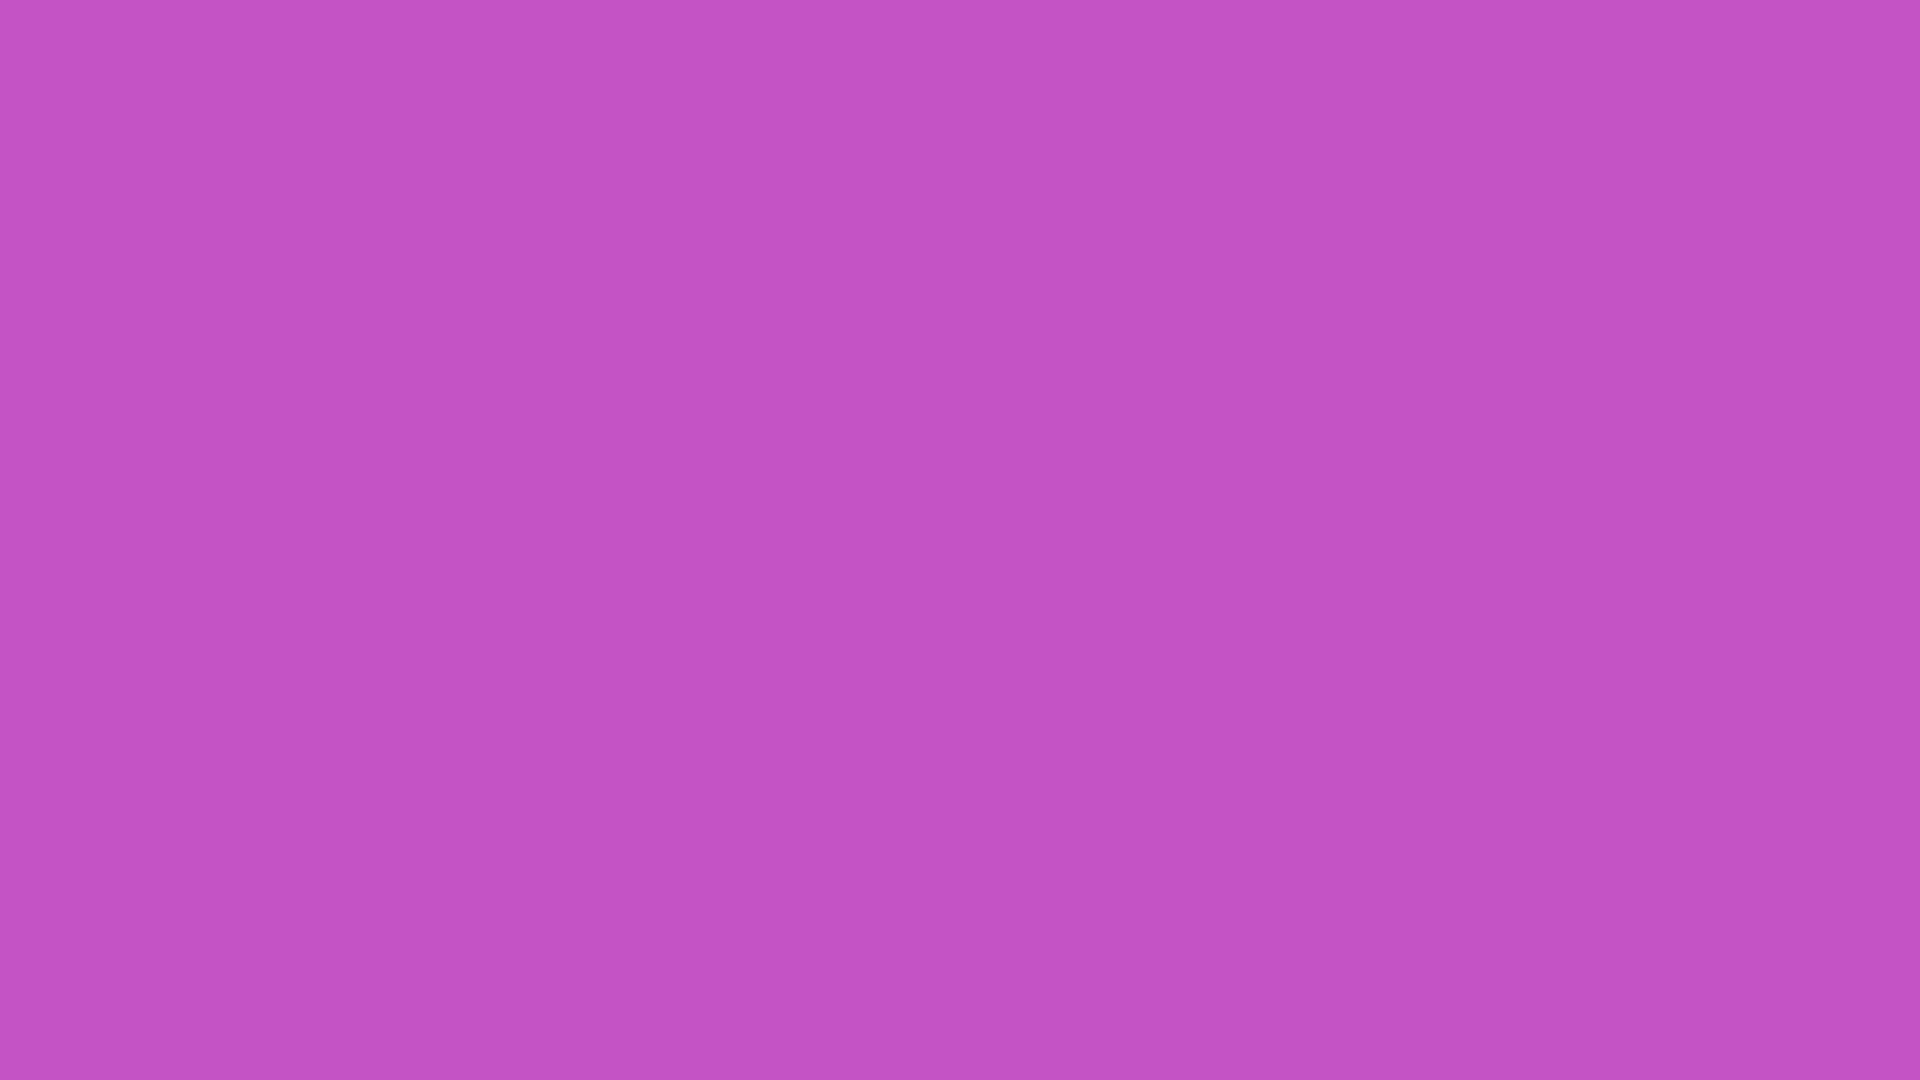 1920x1080 Fuchsia Crayola Solid Color Background